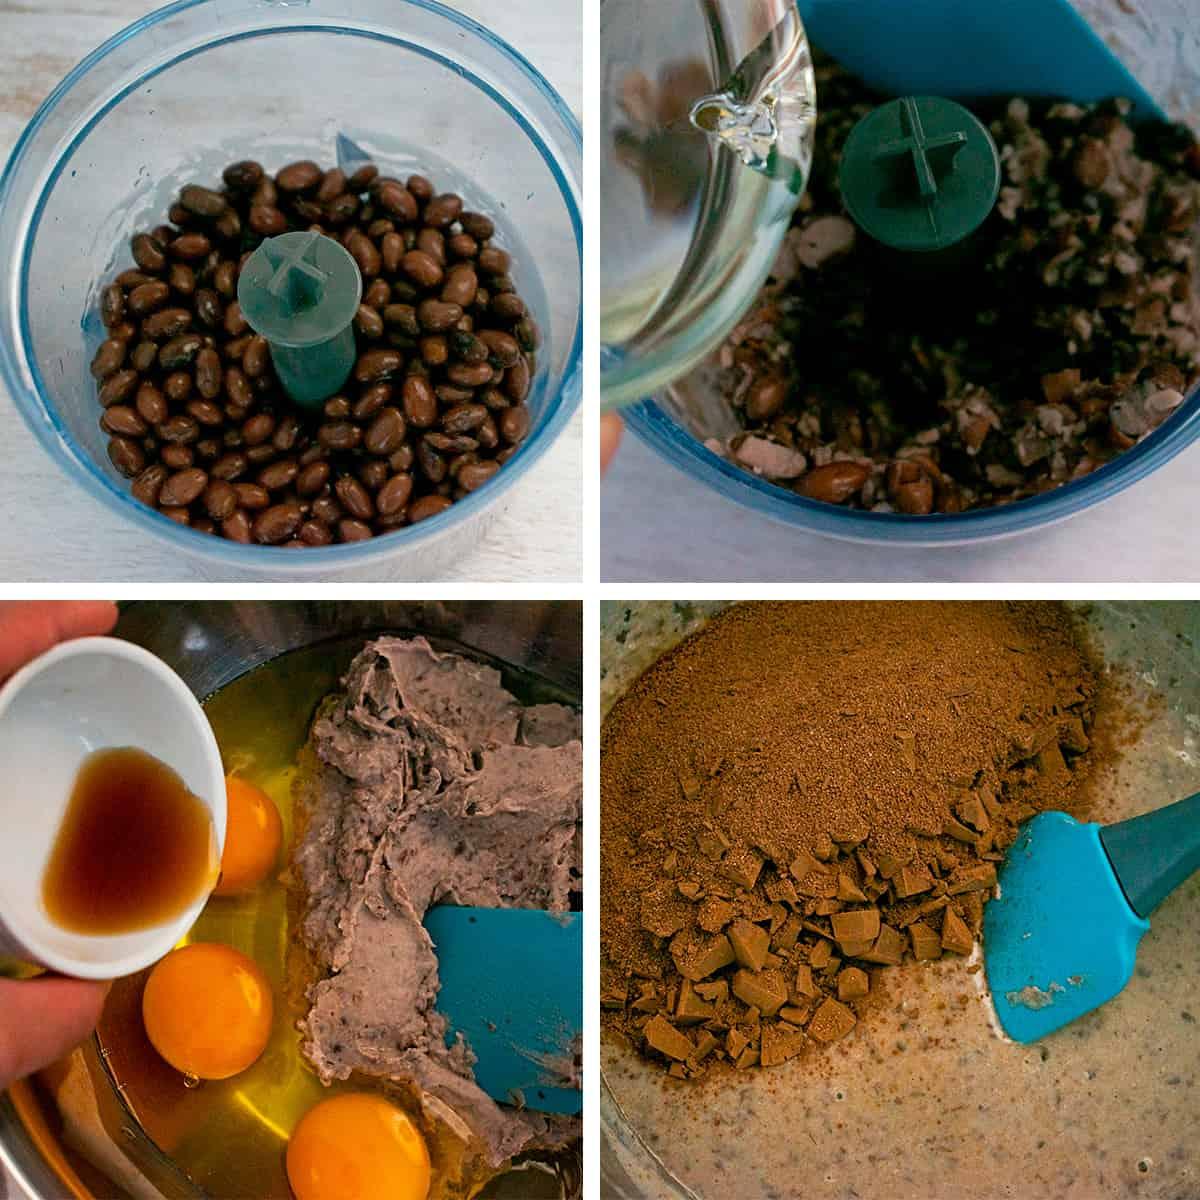 Receta paso a paso para preparar brownies